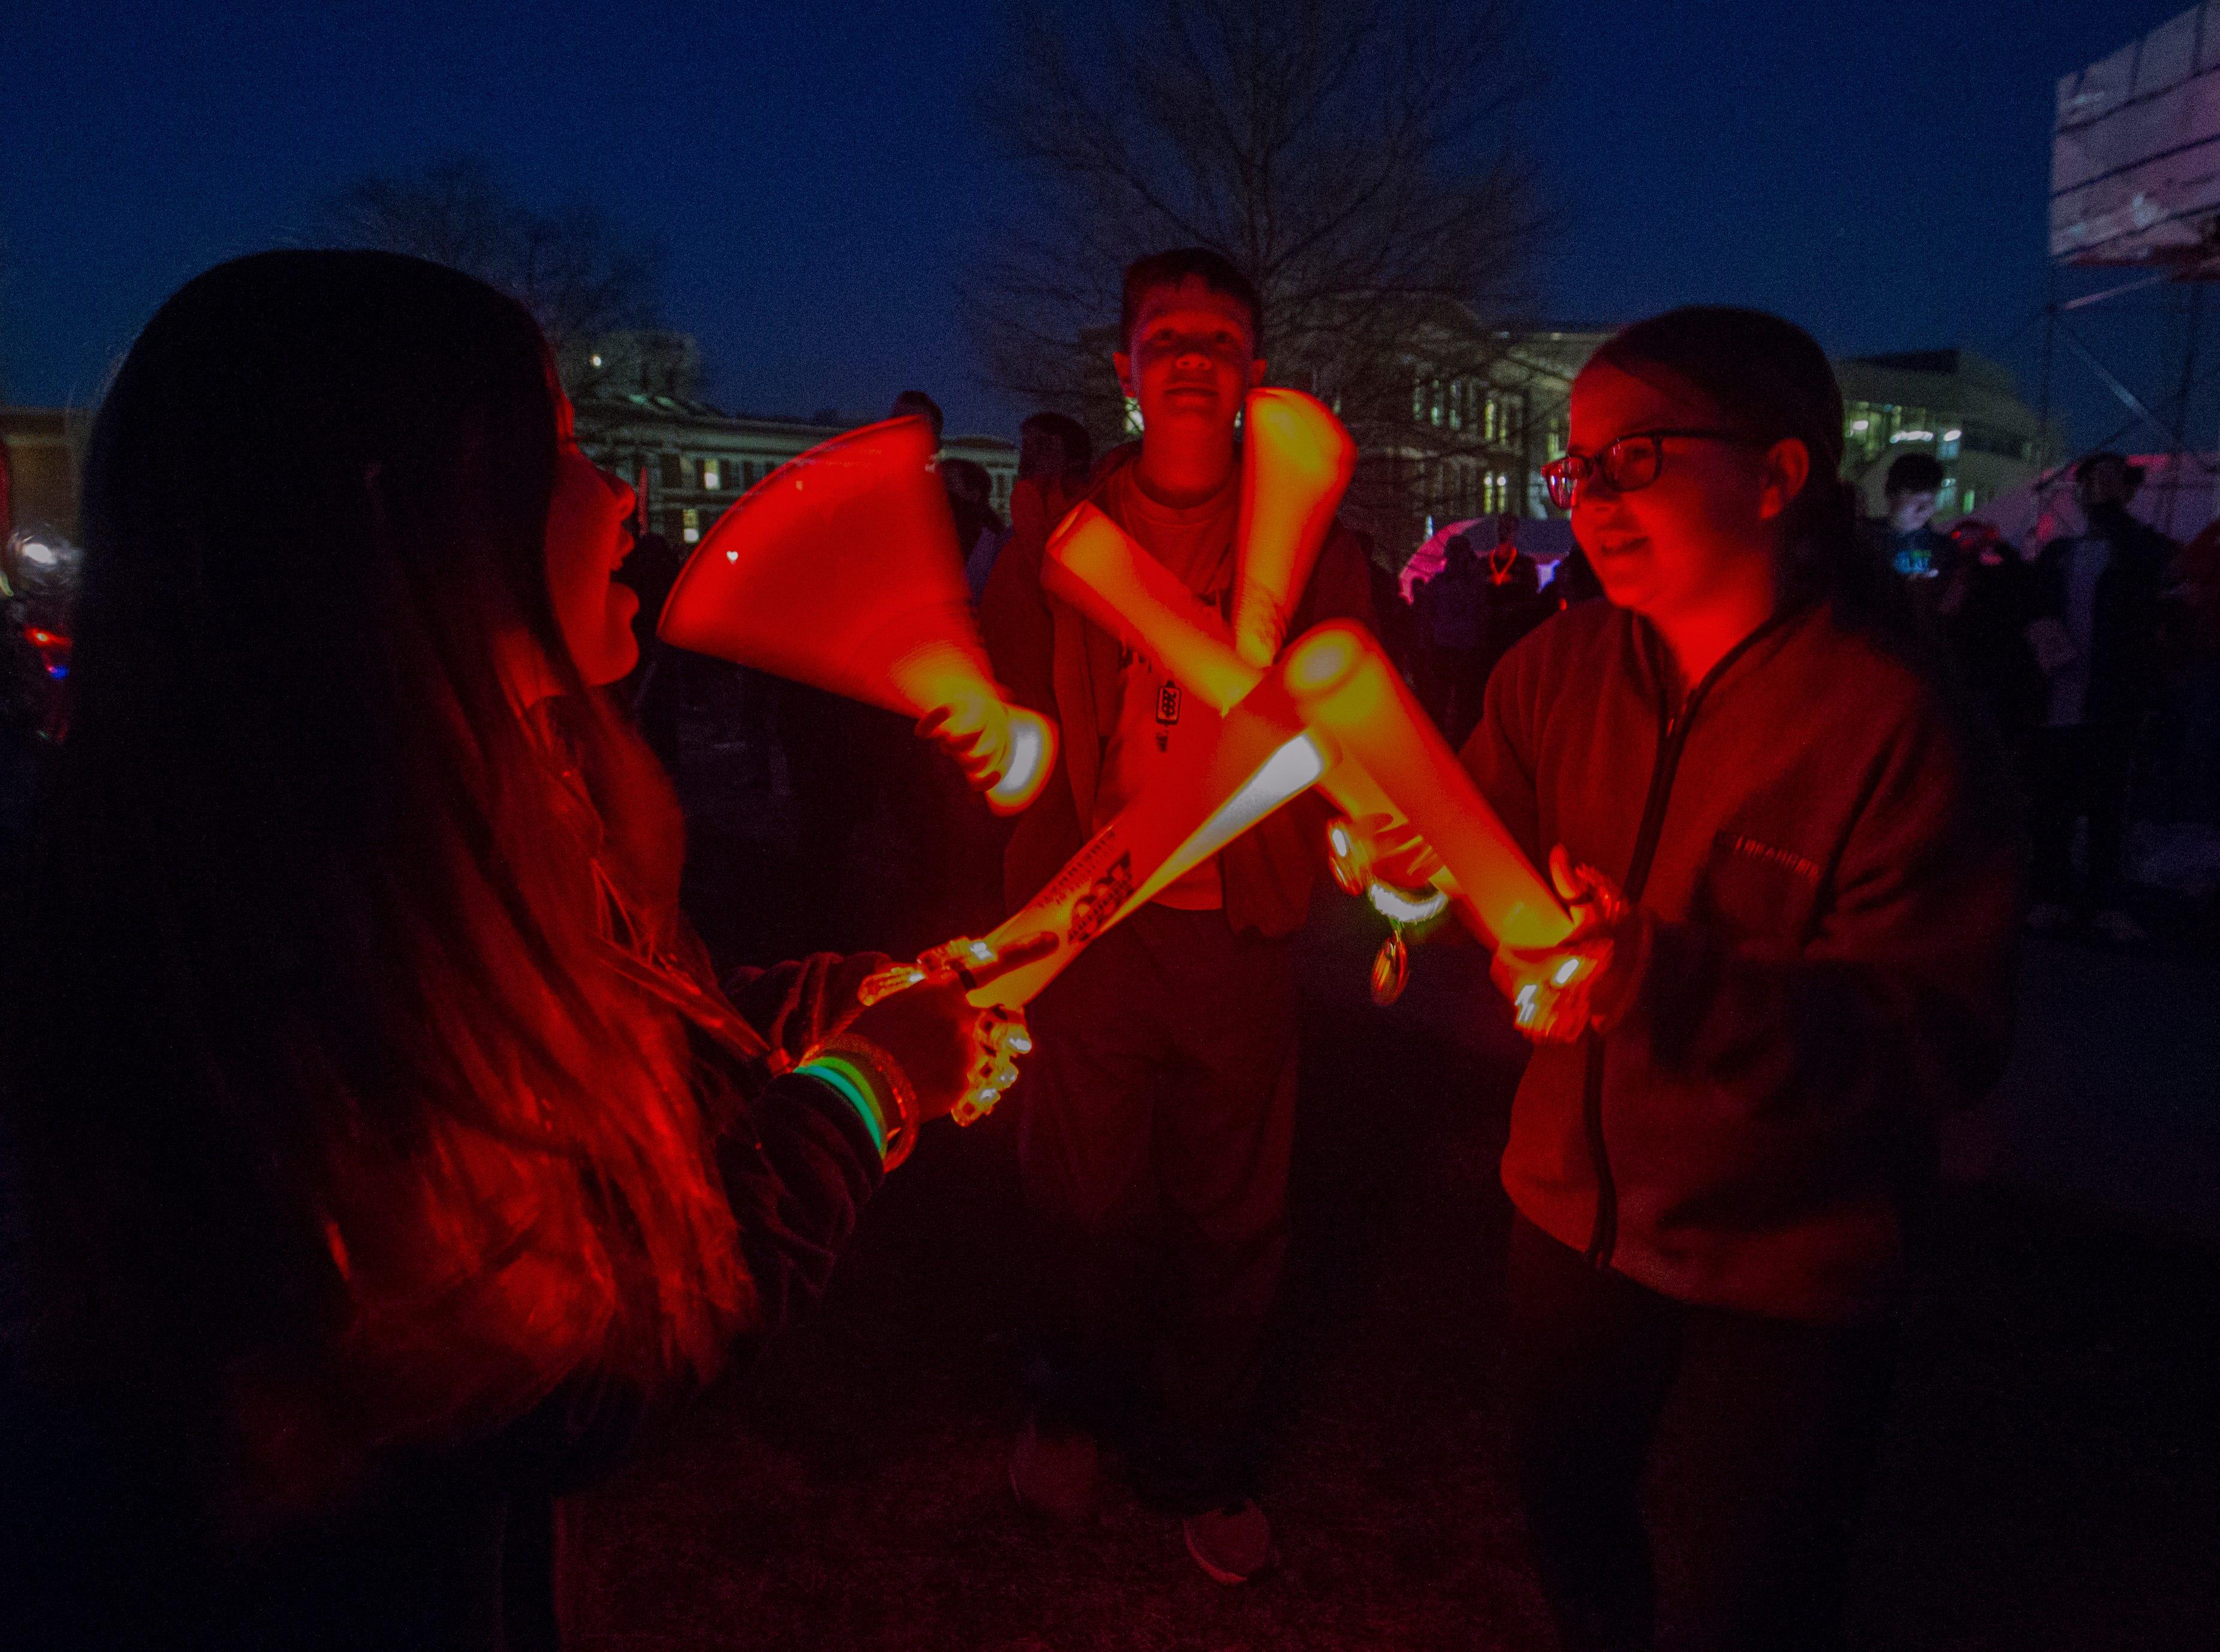 Kids played with their glow sticks during Momentum Projection-Mapping Light Show Saturday April 6, 2019. University of Cincinnati/Joseph Fuqua II